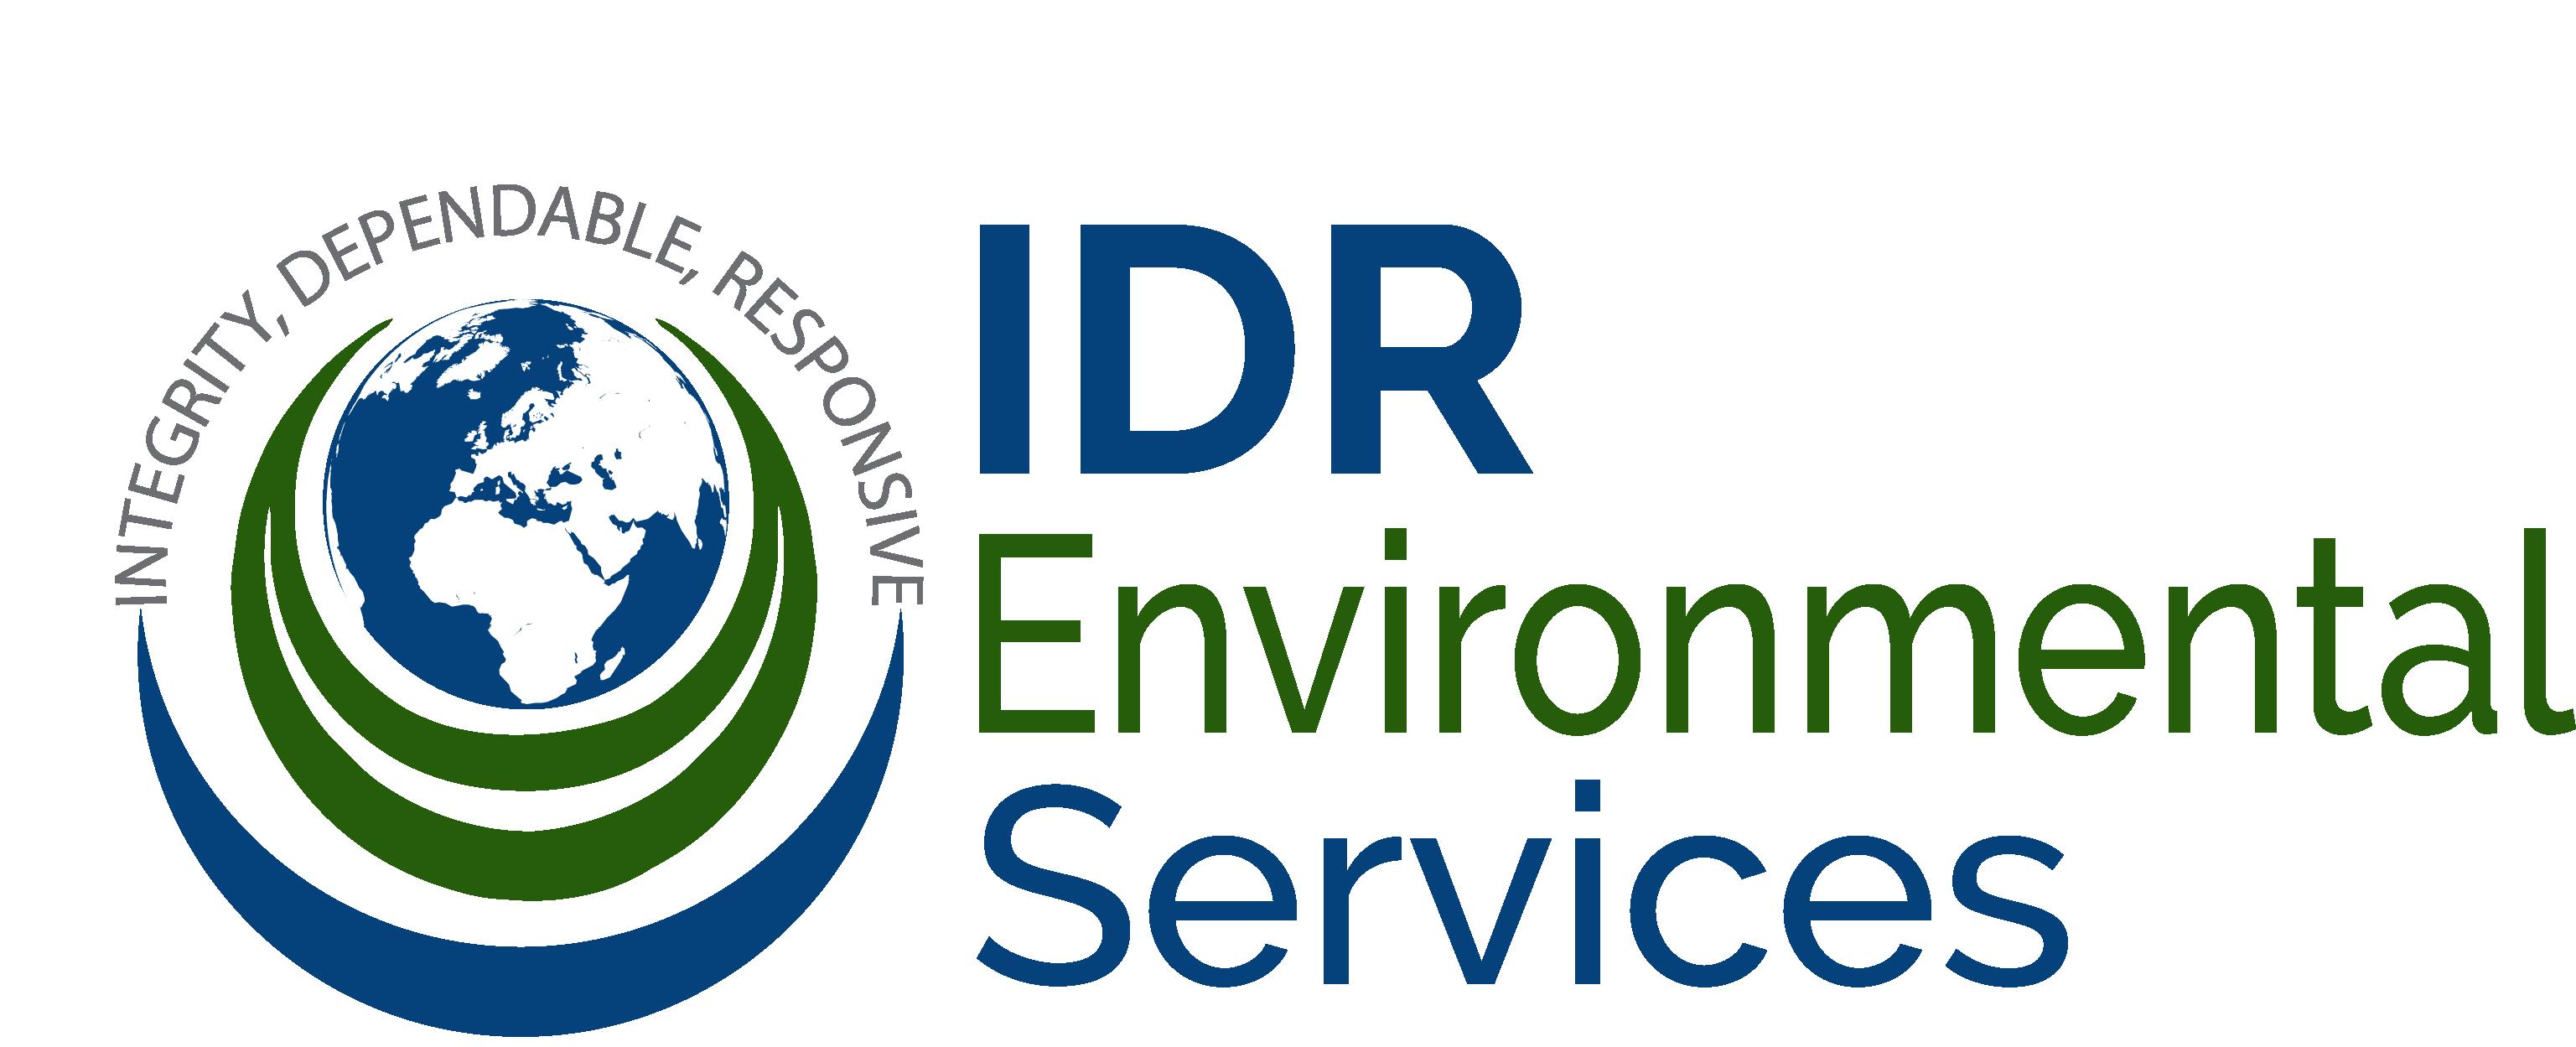 IDR Environmental